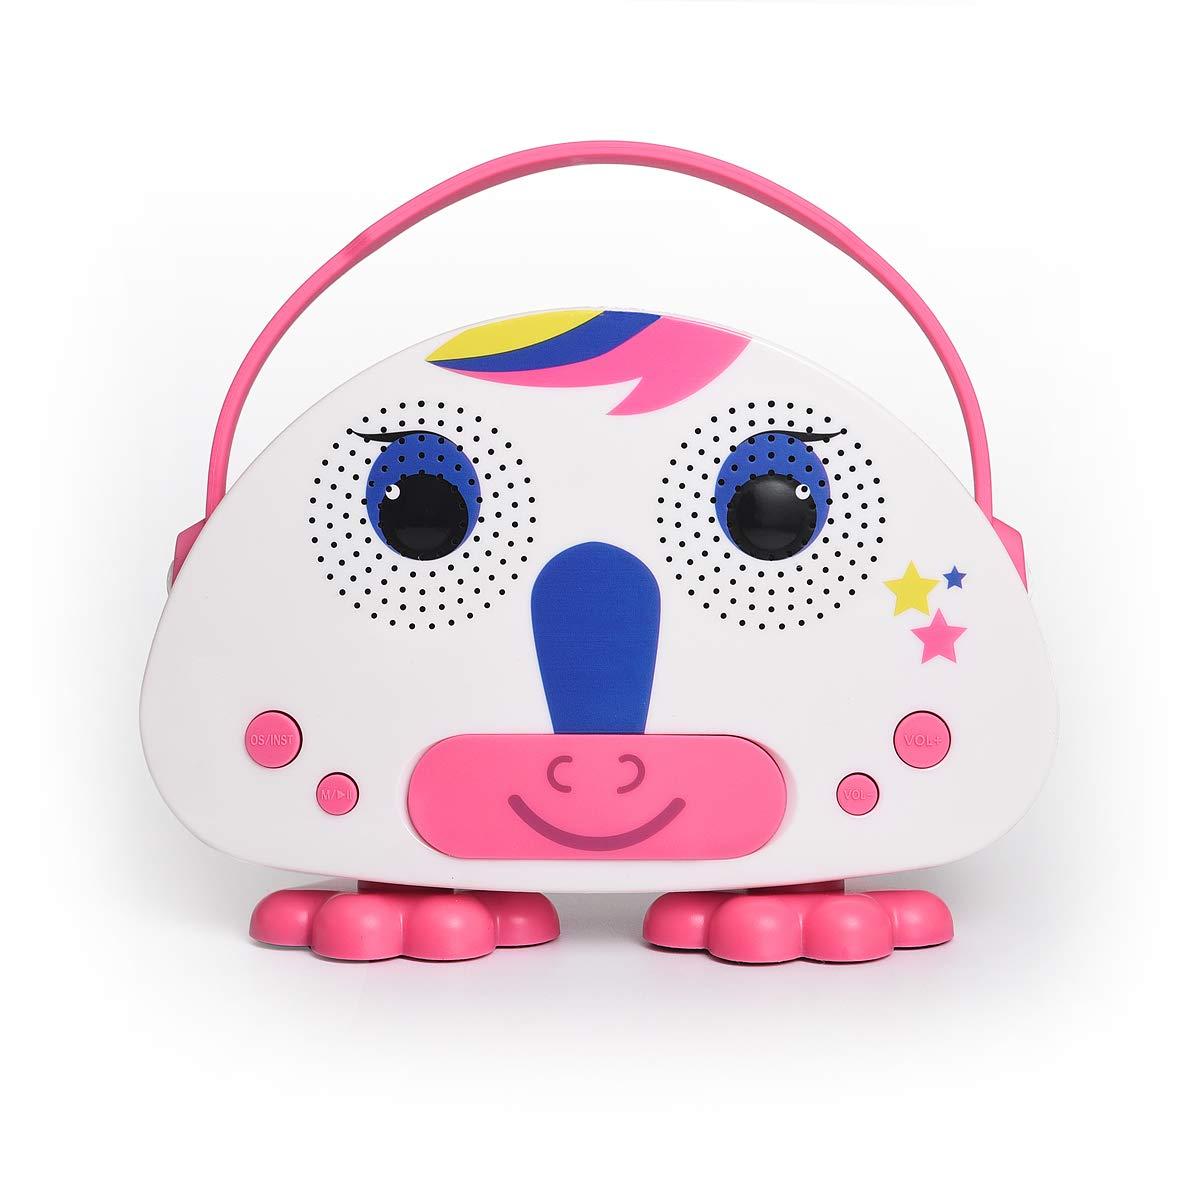 HowQ Outdoor Toys Karaoke Machine , Portable Kids Karaoke Bluetooth Speaker Wireless Cartoon Speaker for Kids for Indoor Toys Travel Activities with Microphone Karaoke Machine(Pink-White) by HowQ (Image #2)